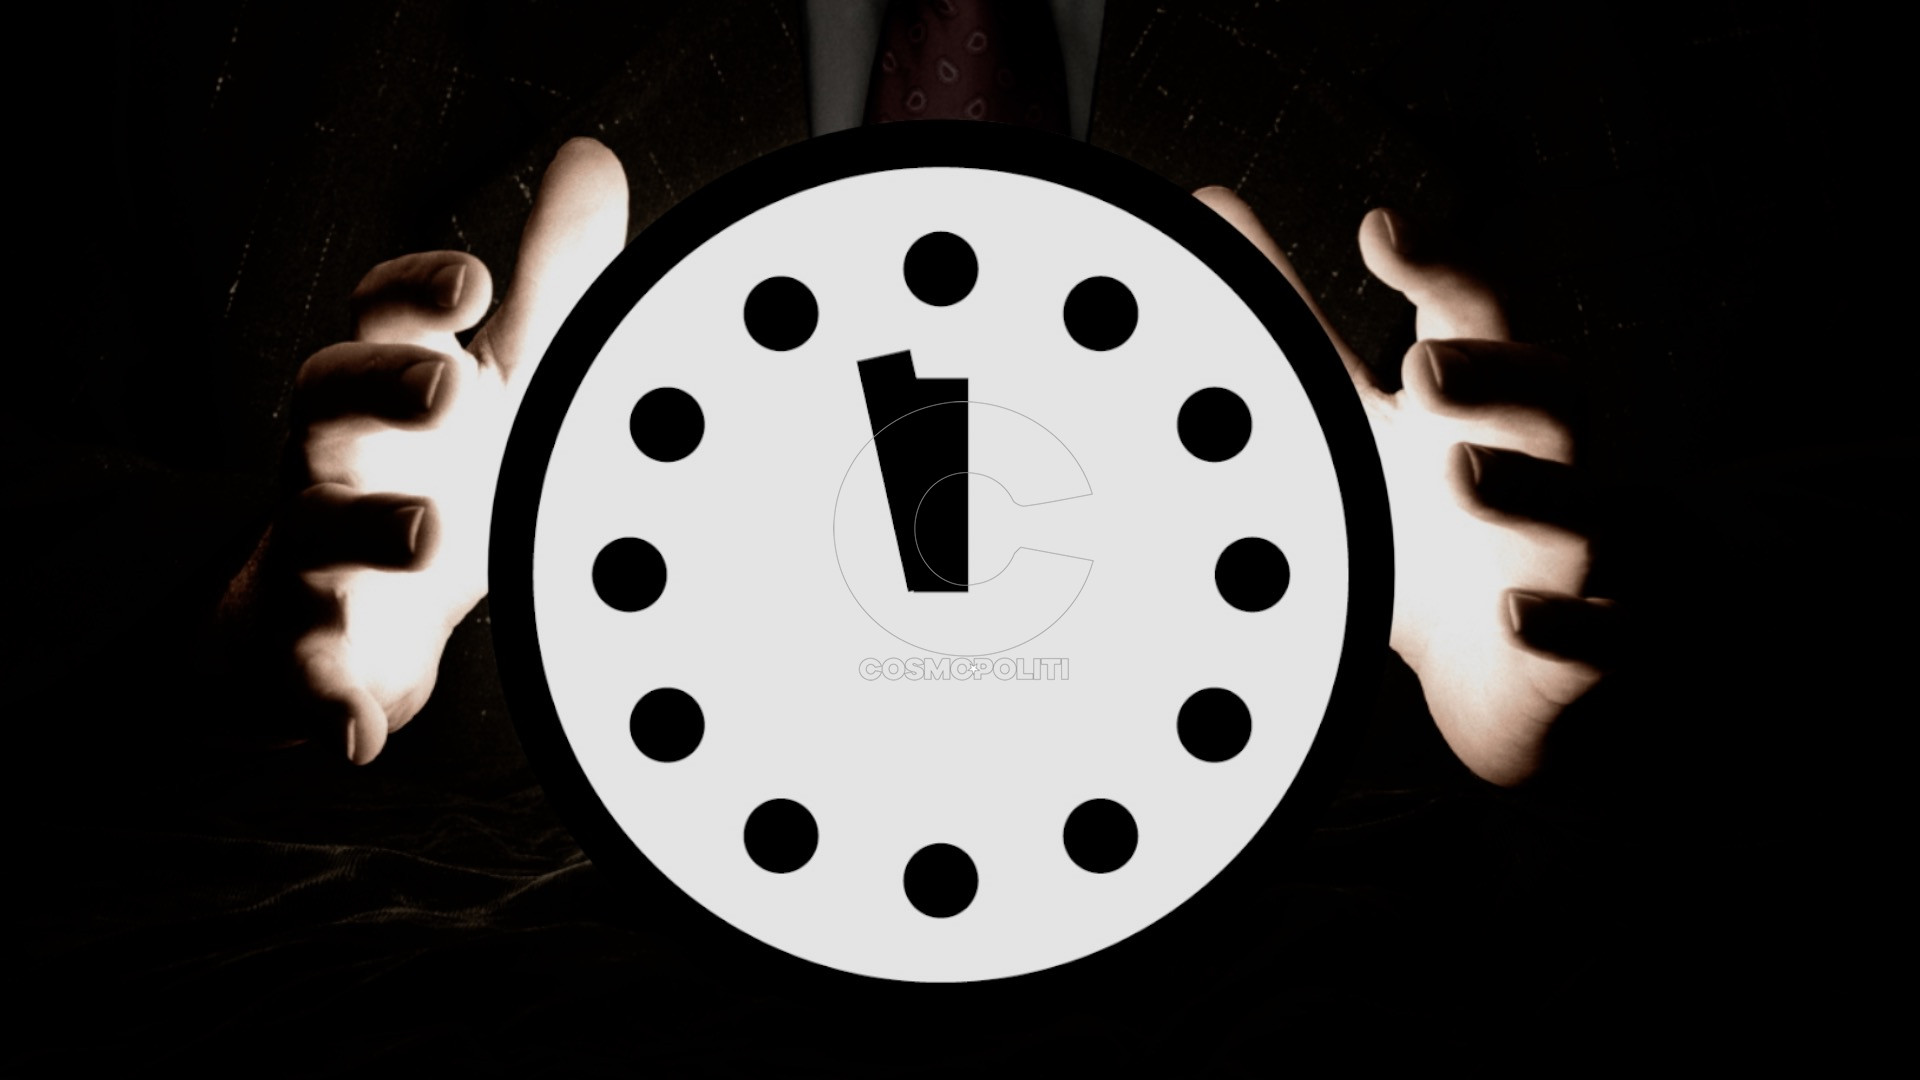 t_1508518886197_name_20170928_TheGlobeandMail_Explainer_DoomsdayClock_still